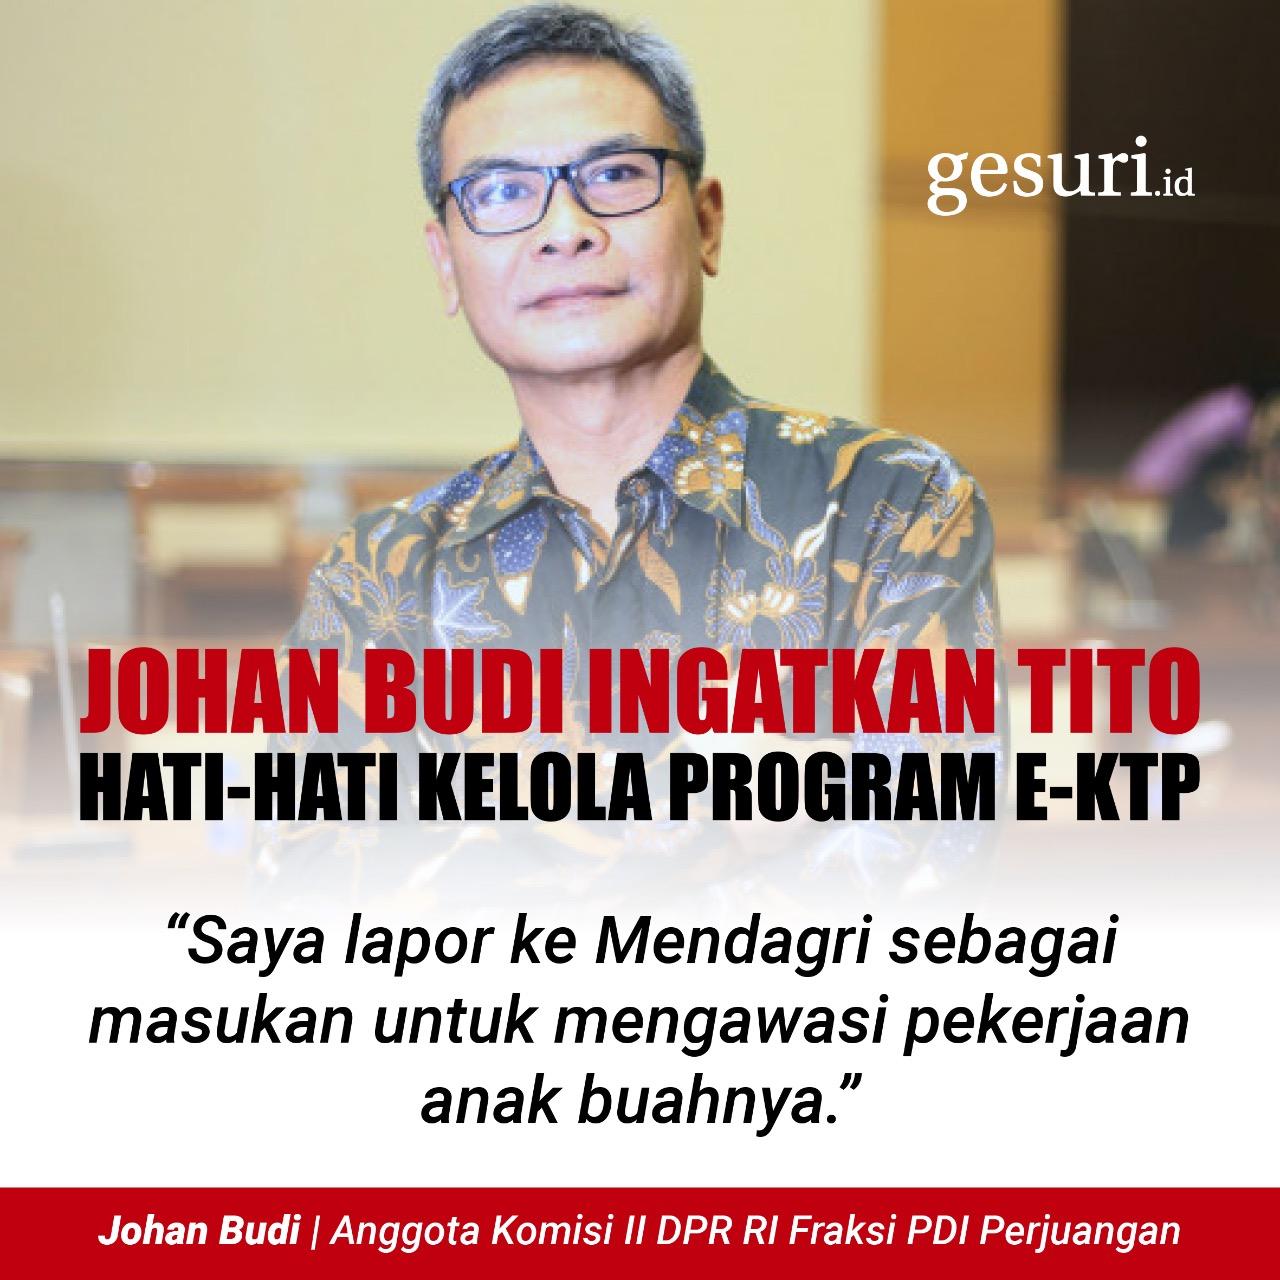 Johan Budi Ingatkan Tito Hati-Hati Kelola Program E-KTP